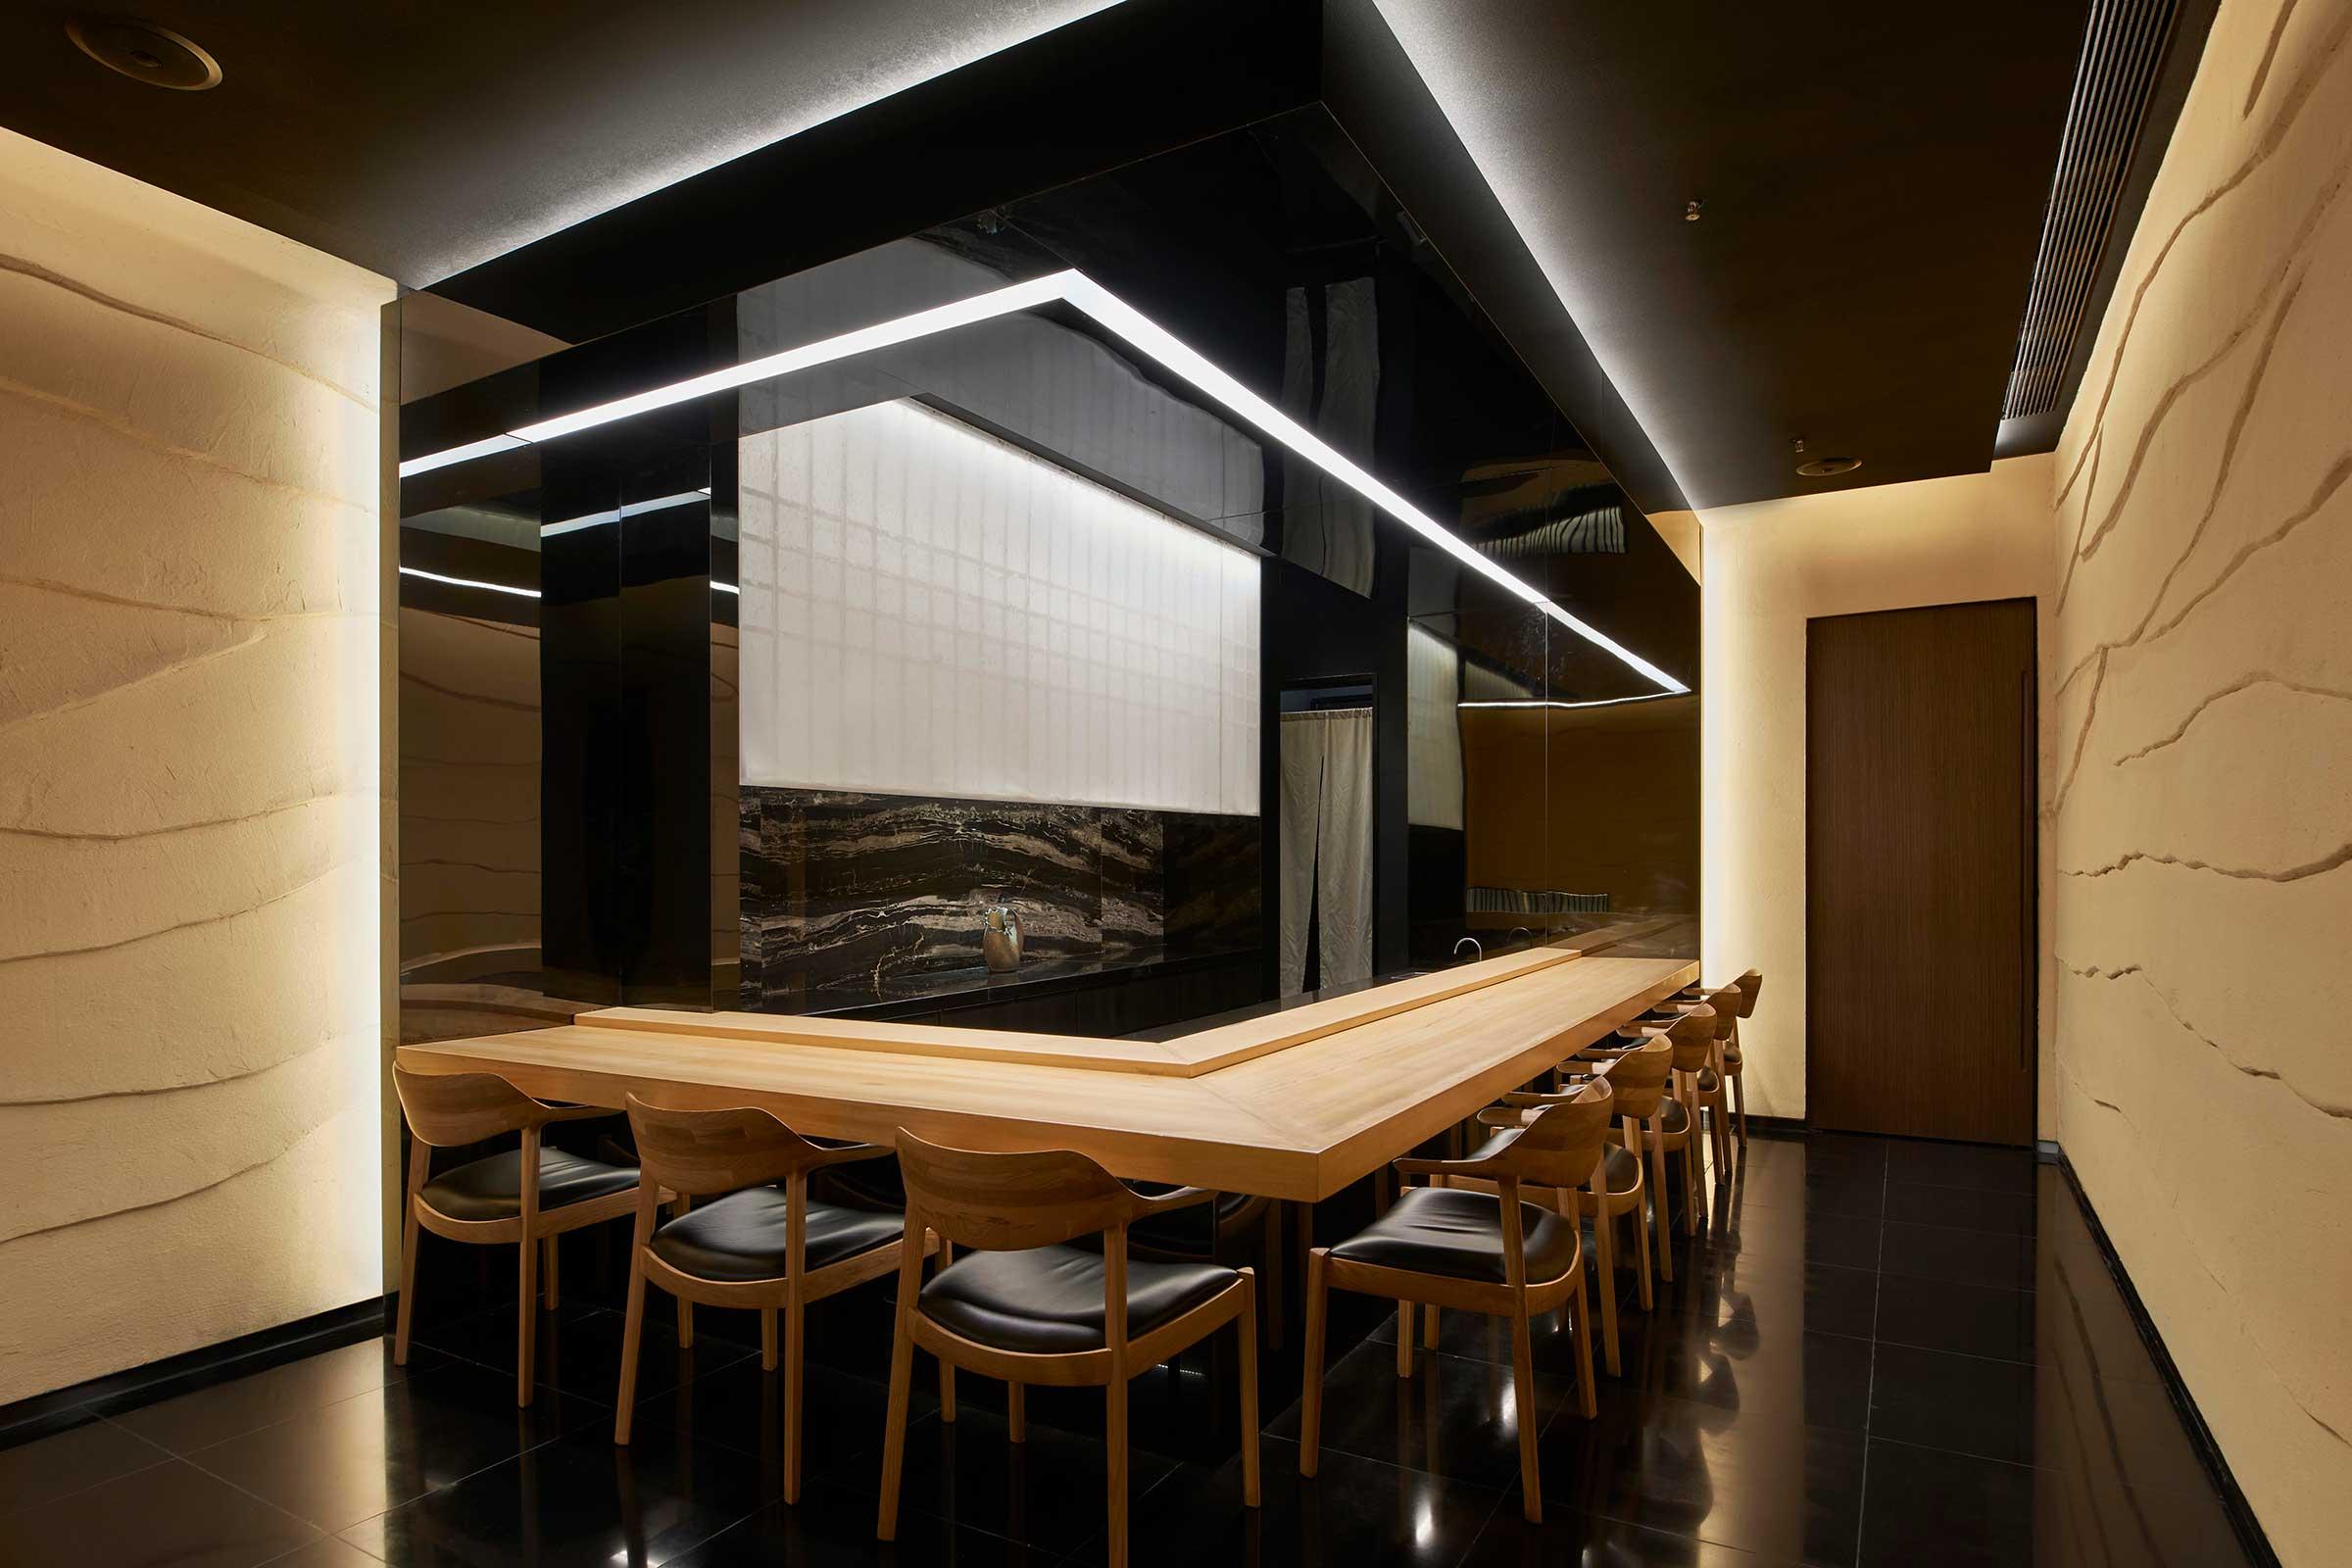 8-person-dining-room-sushi-b.jpg